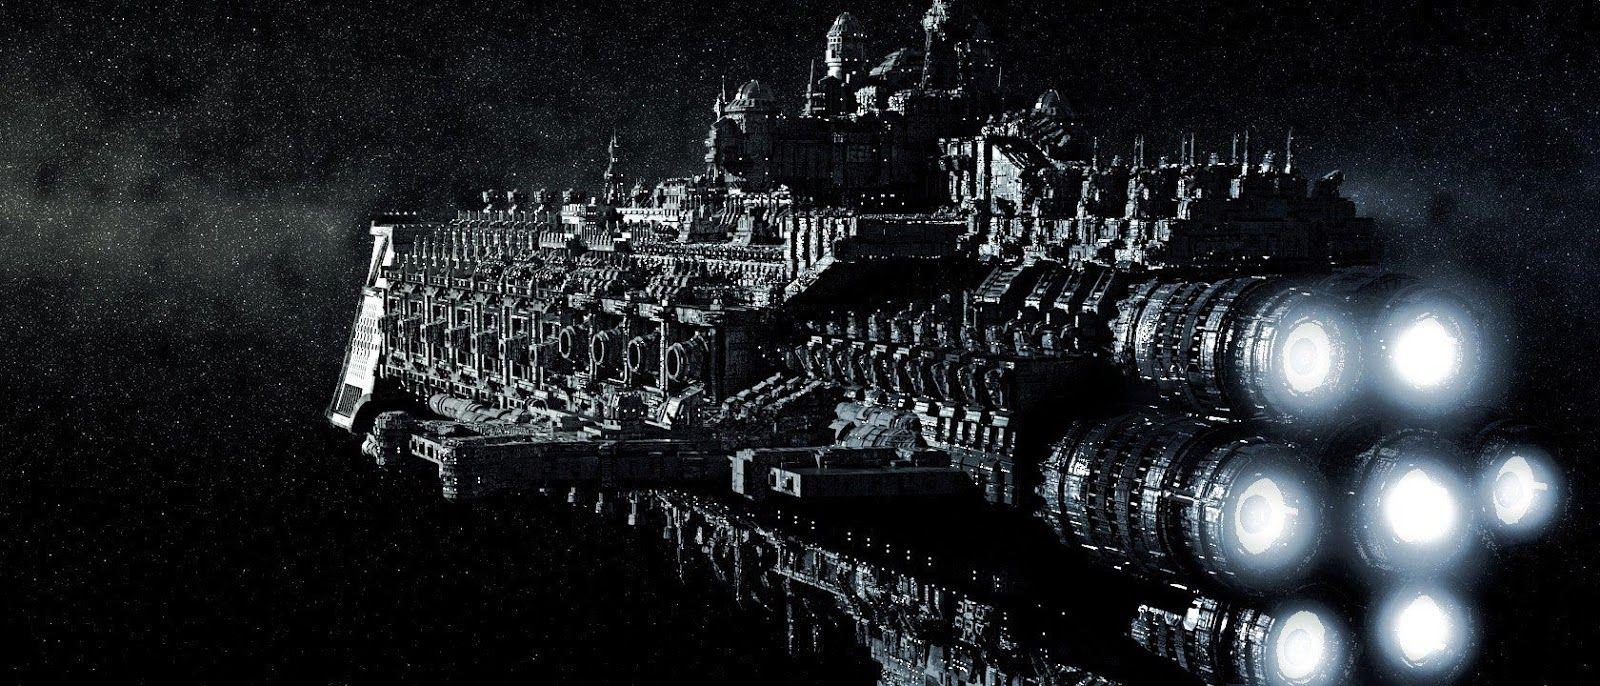 40k wallpapers   Album on Imgur Future At Hand Warhammer 40k 1600x686